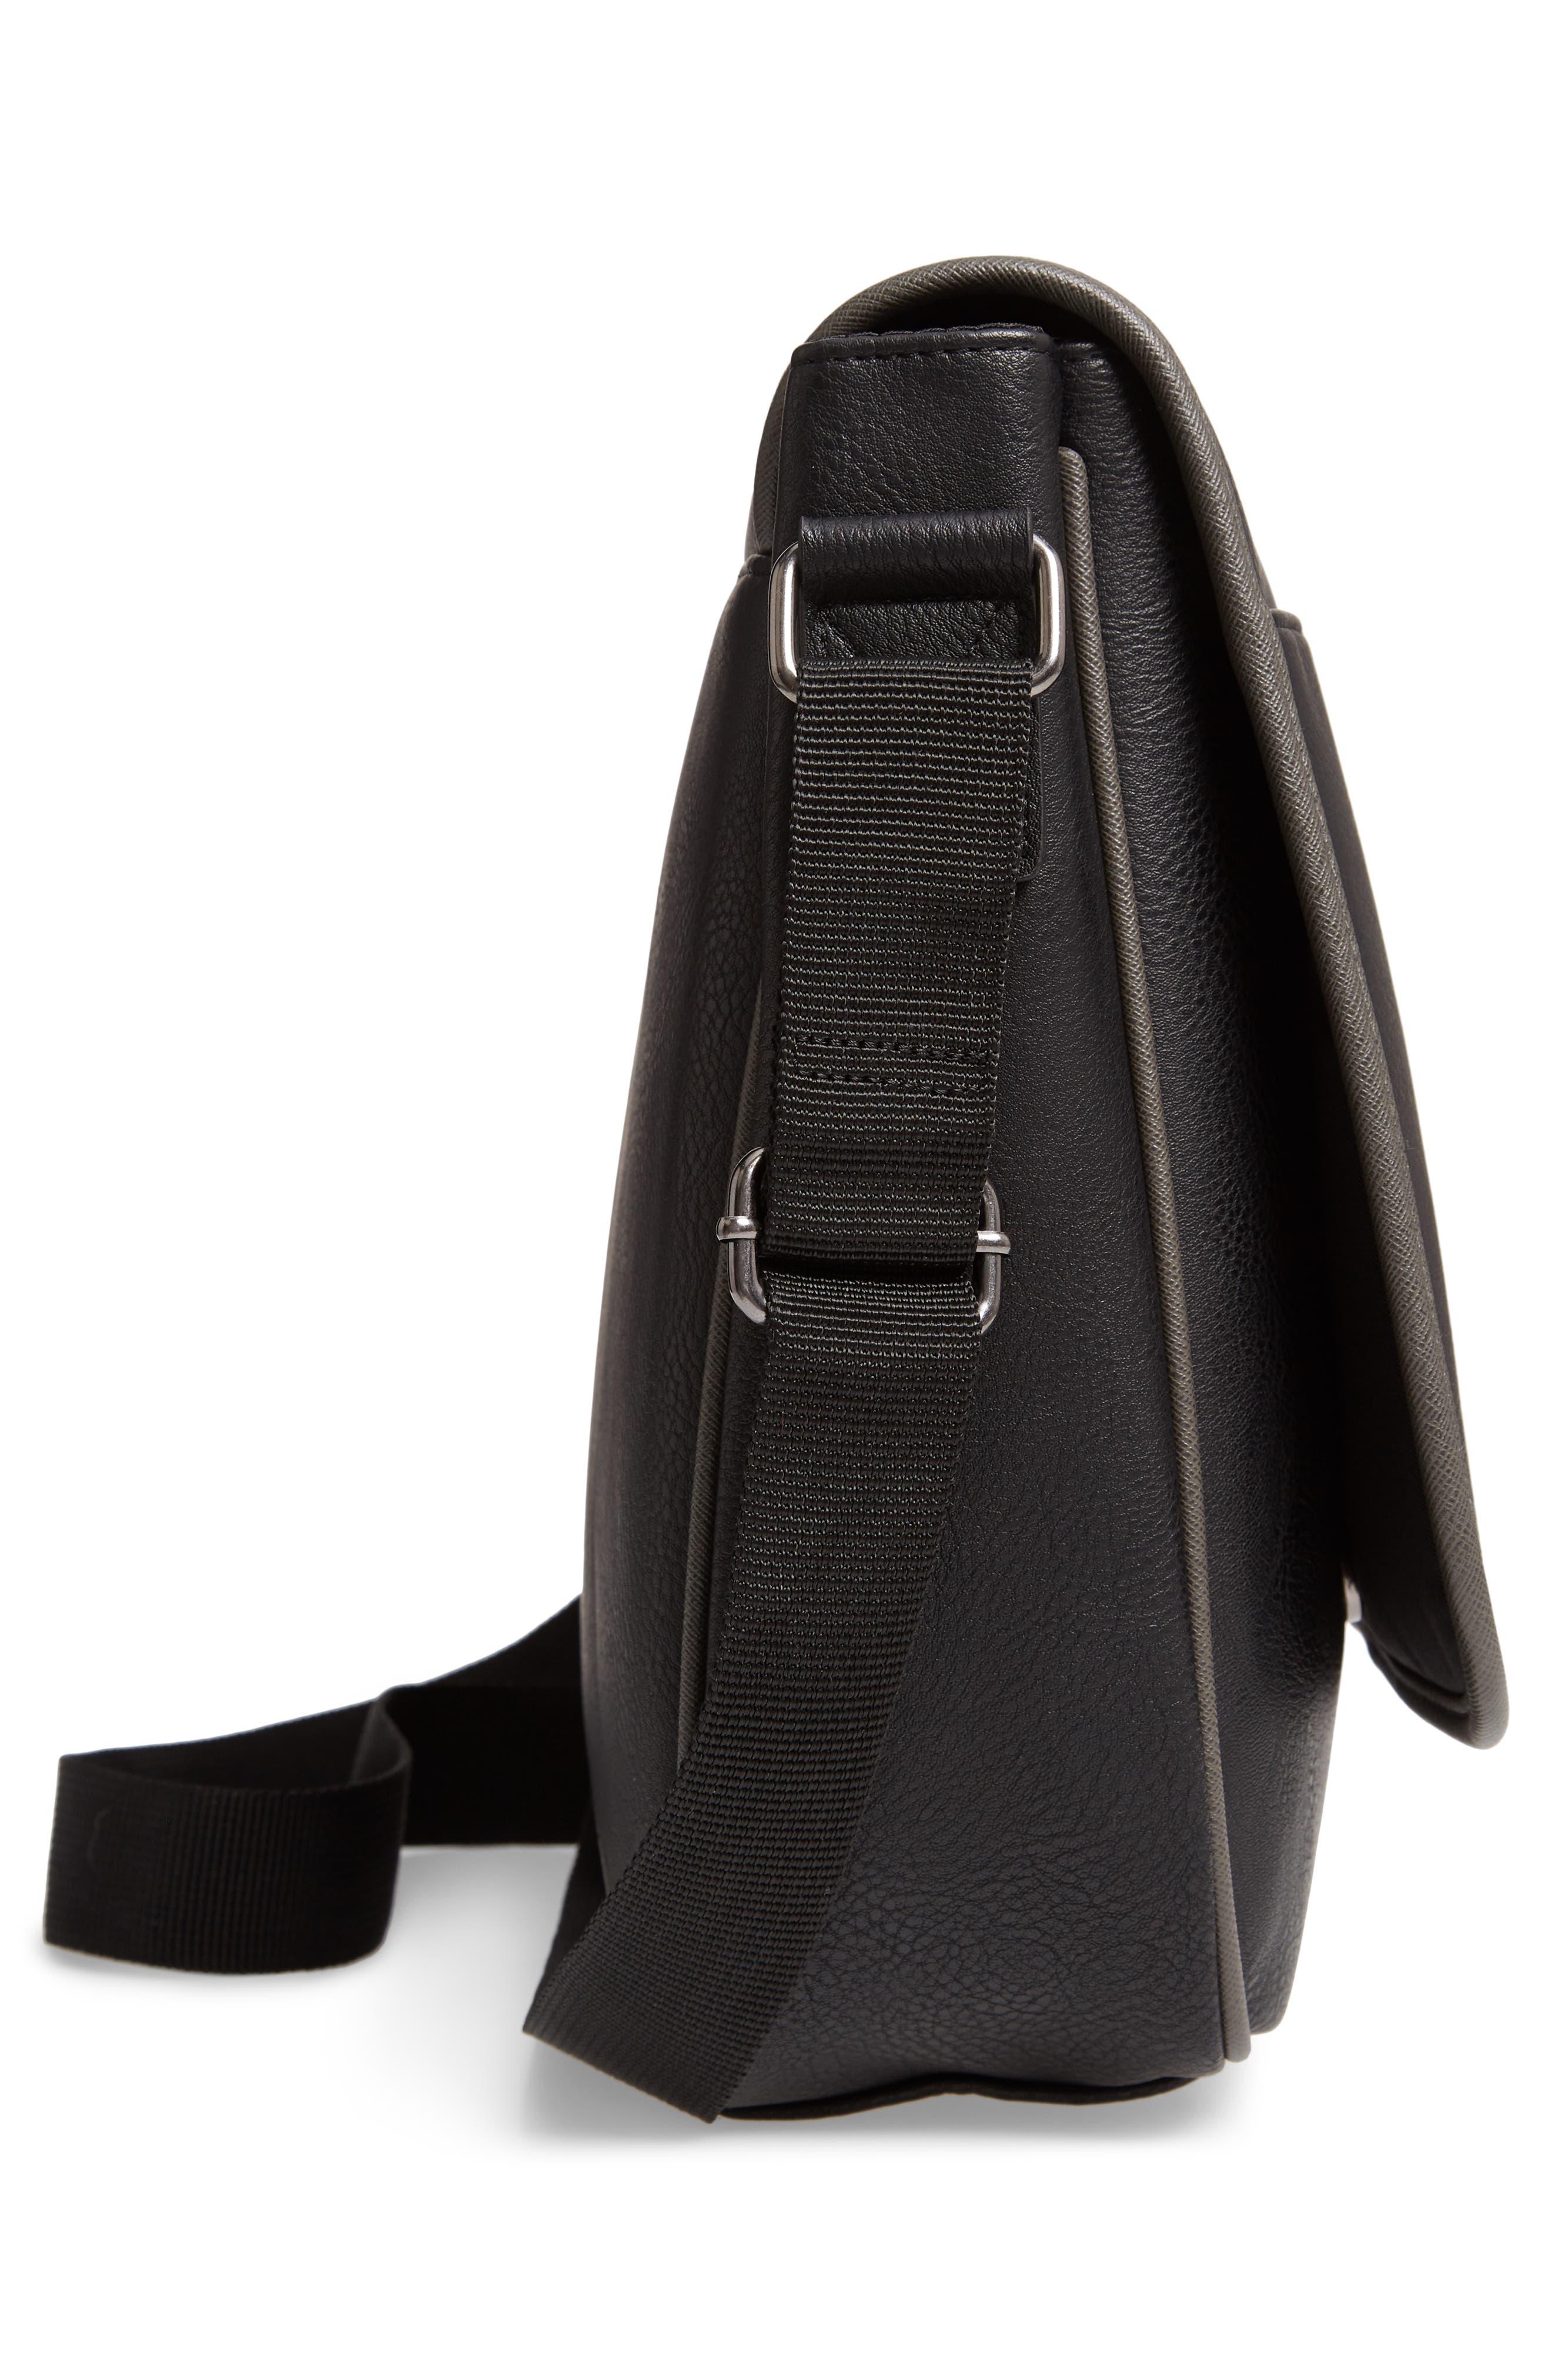 Kingcol Faux Leather Messenger Bag,                             Alternate thumbnail 4, color,                             Black